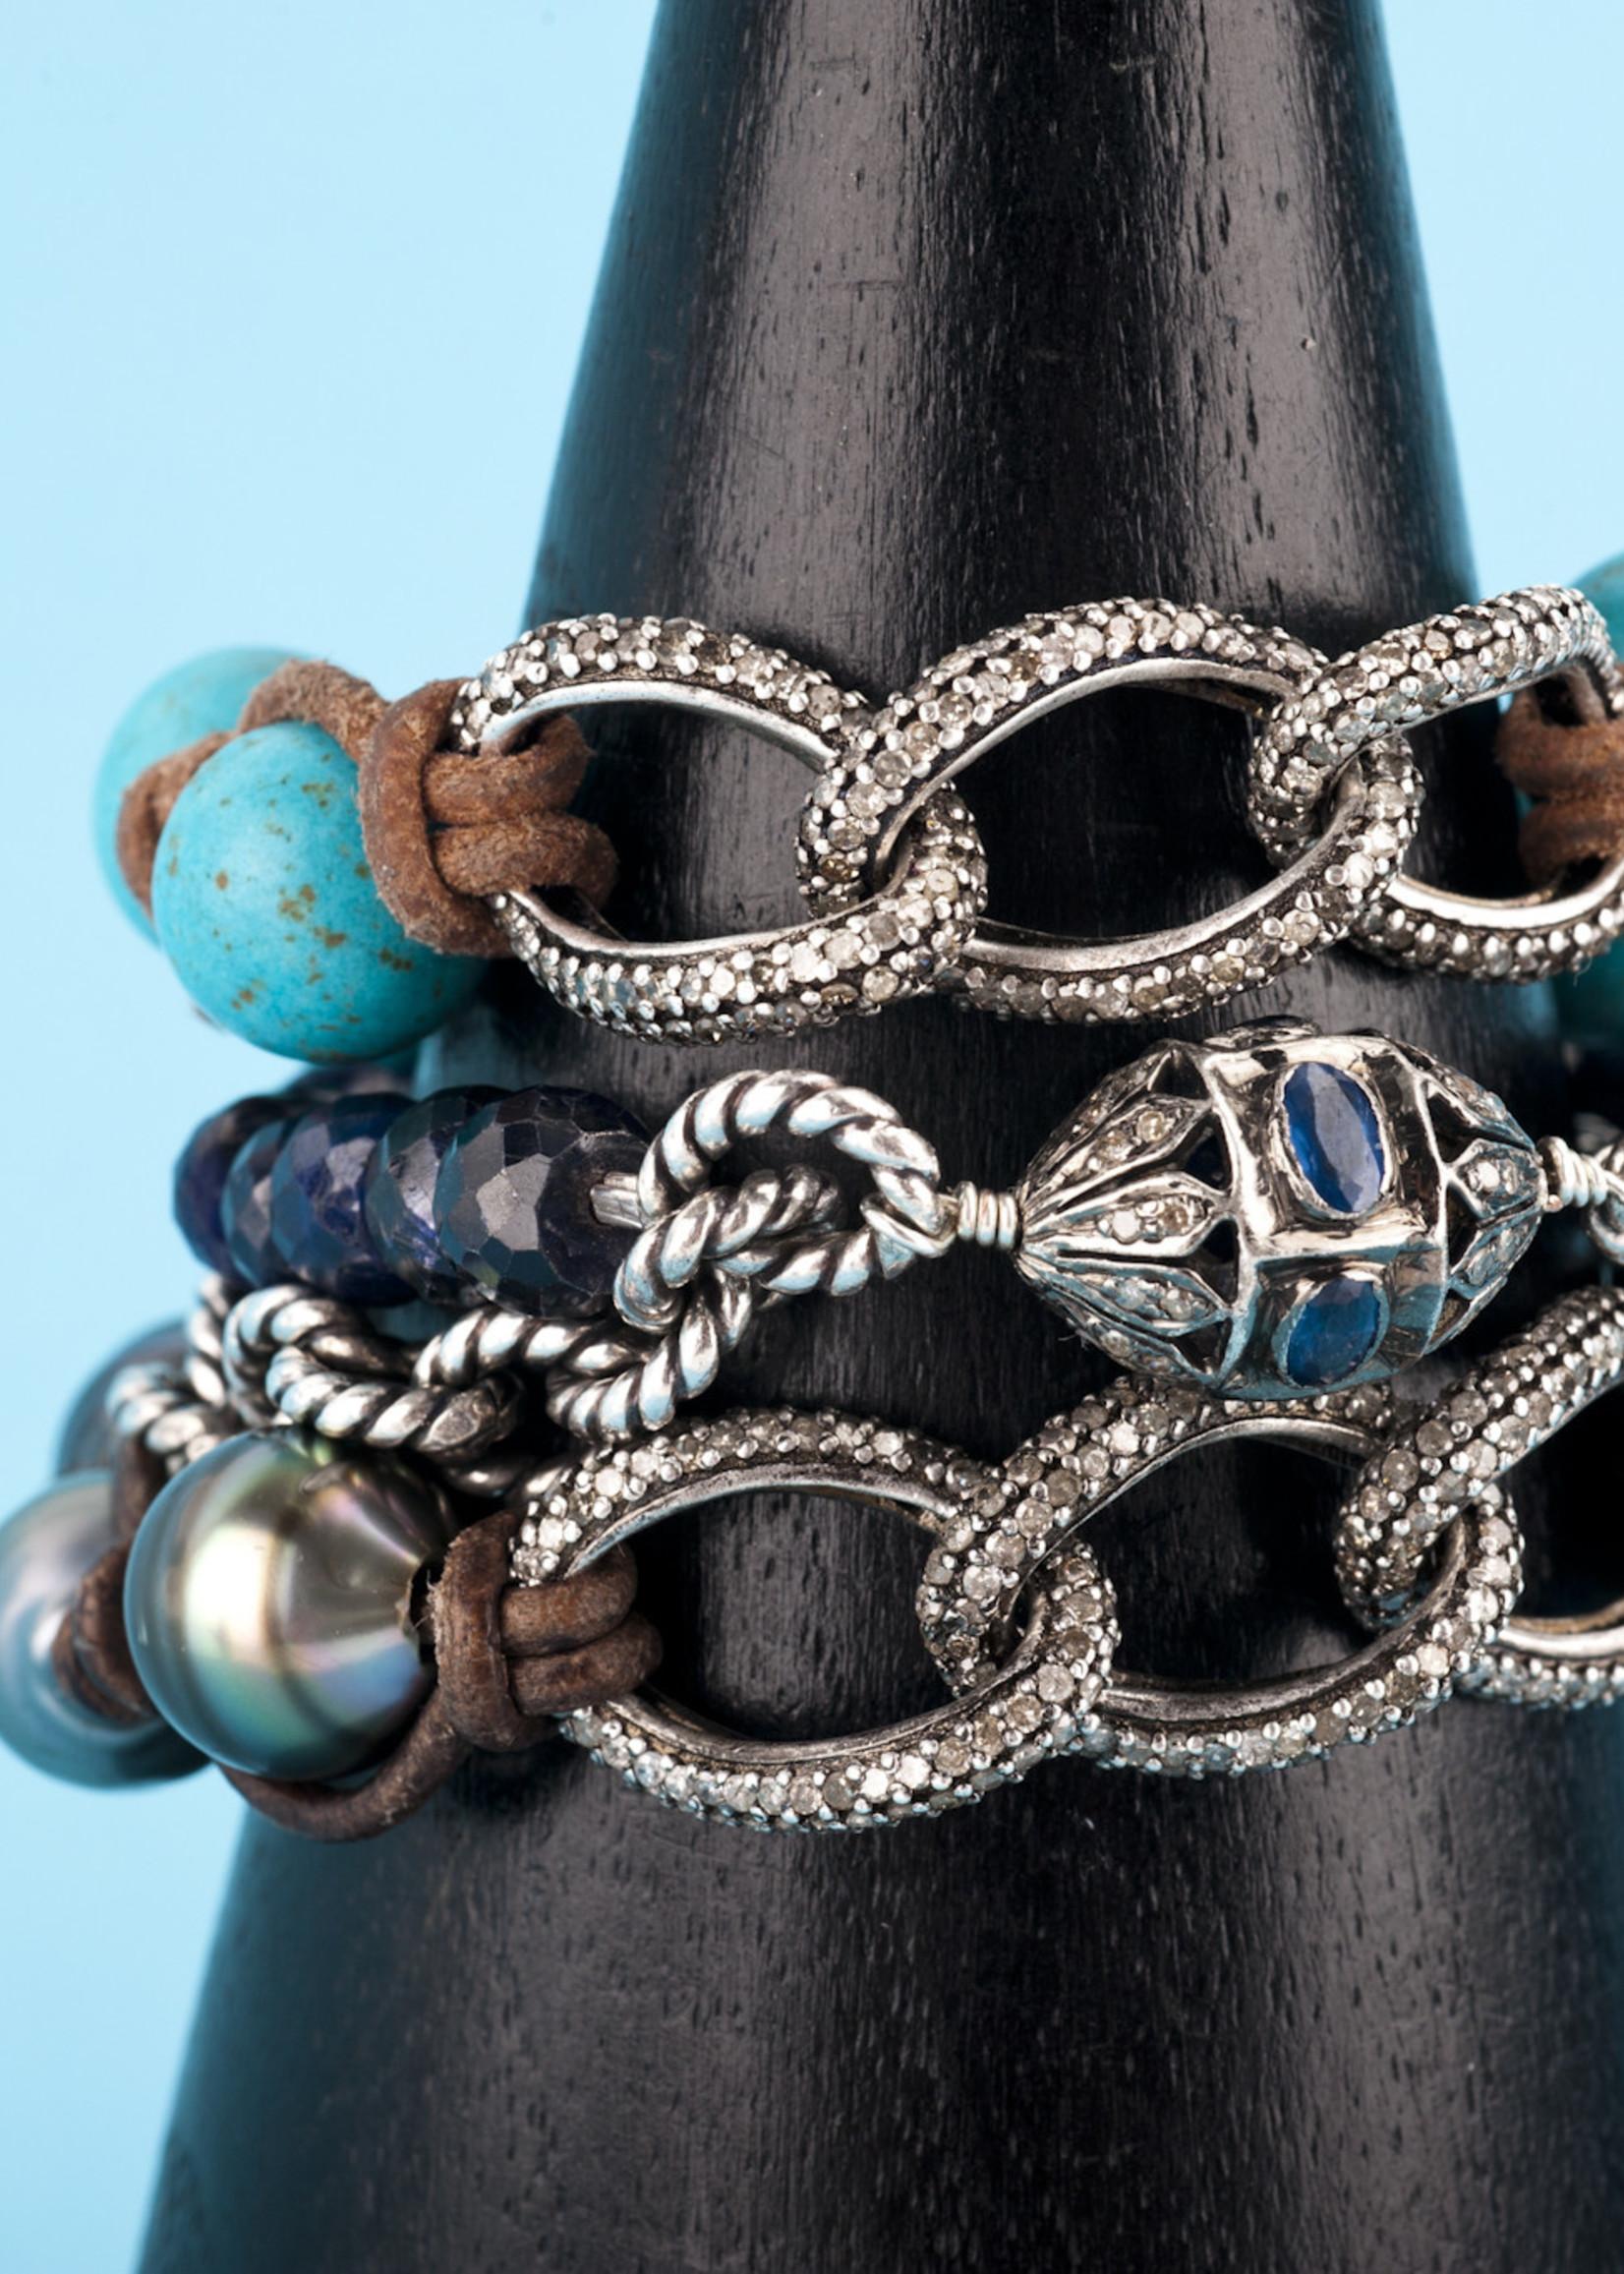 Mina Danielle Pavé Diamond Links with Turquoise Beads on Tan Leather Cord